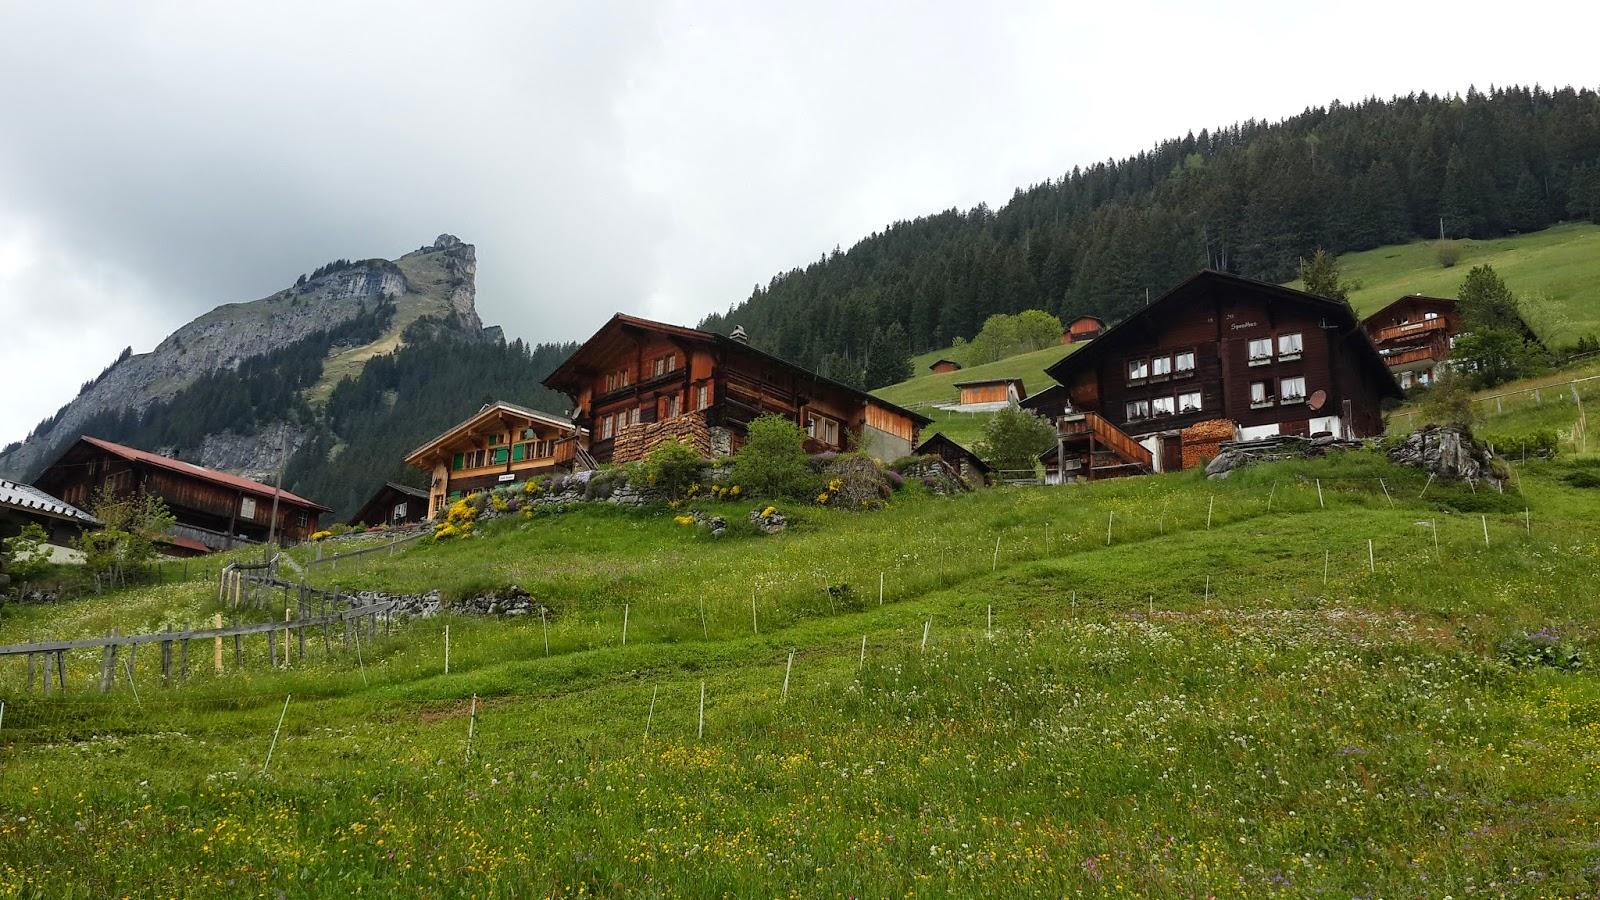 Europe Trip-Trip to Europe tips-Switzerland & Paris trip tips- Blog about Paris & switzerland- Zurich-Luzern-Trummelbachfalle-Gimmelwald Switzerland